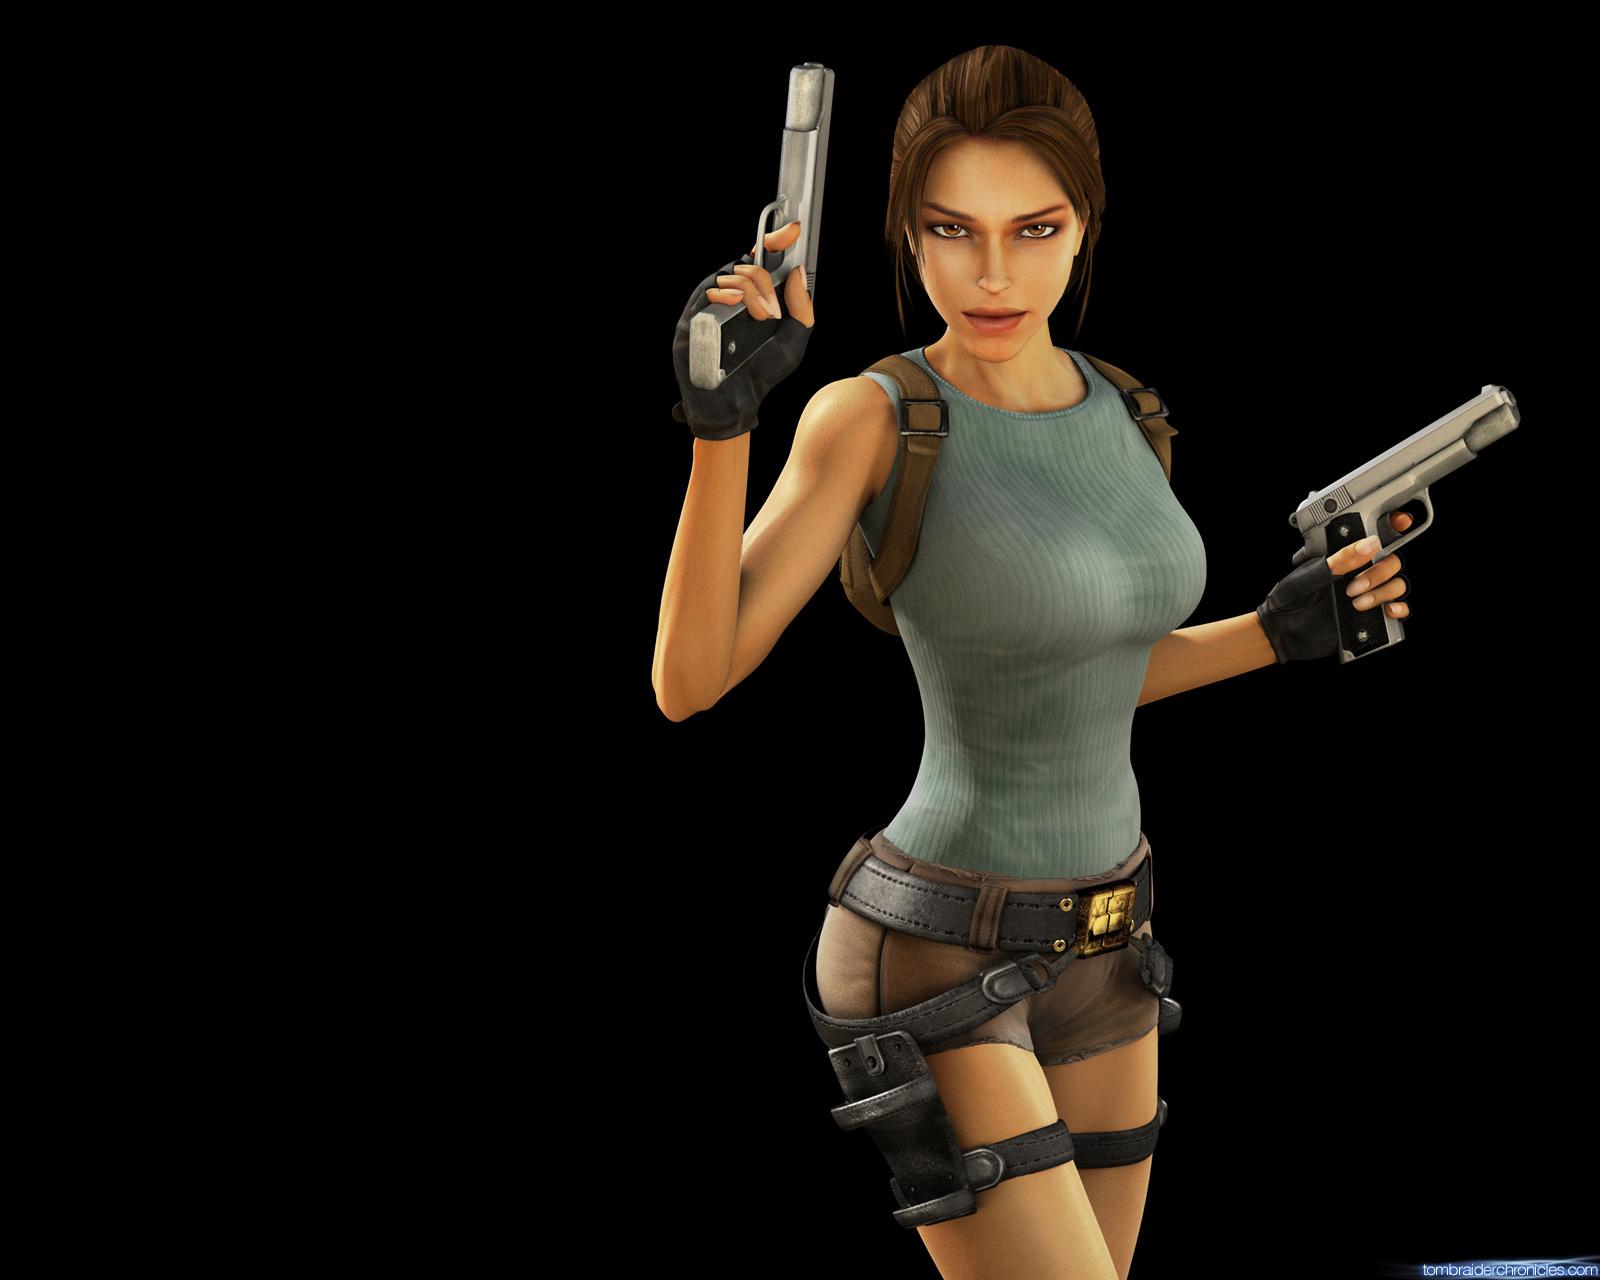 Lara Croft Tomb Raider 6374056 1600 1280